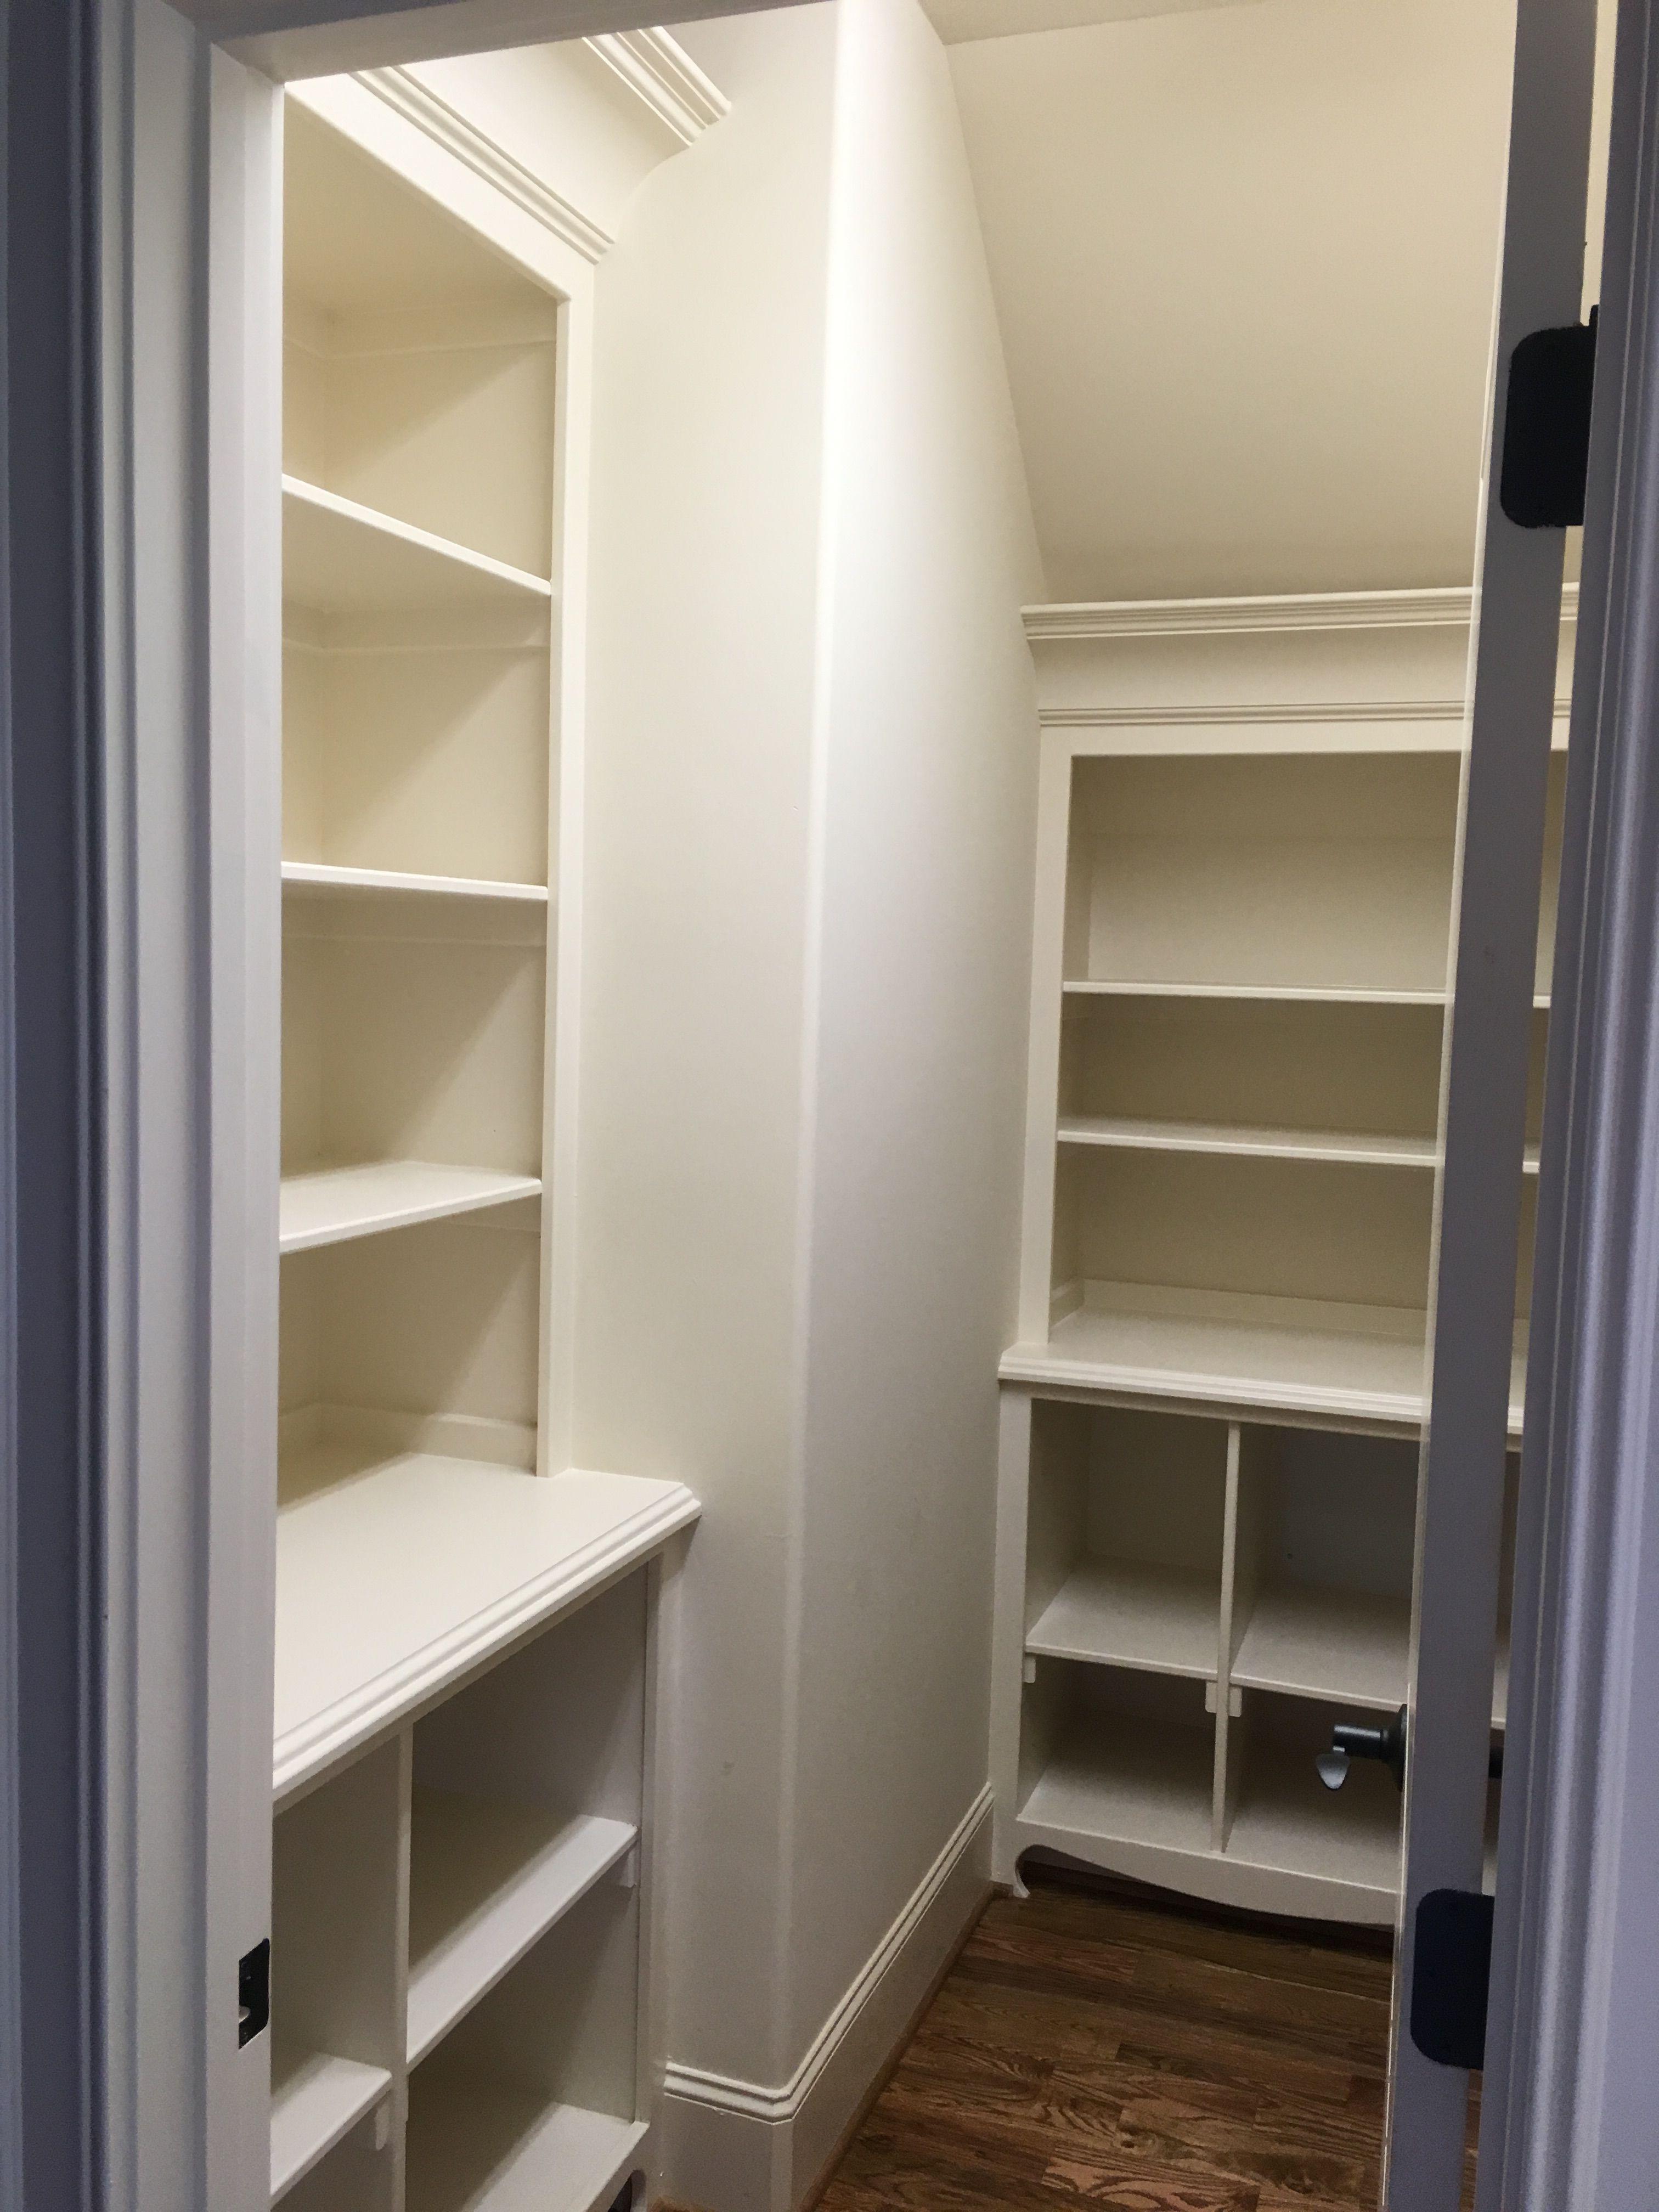 Pantry shelves diykitchen pinterest pantry shelves and